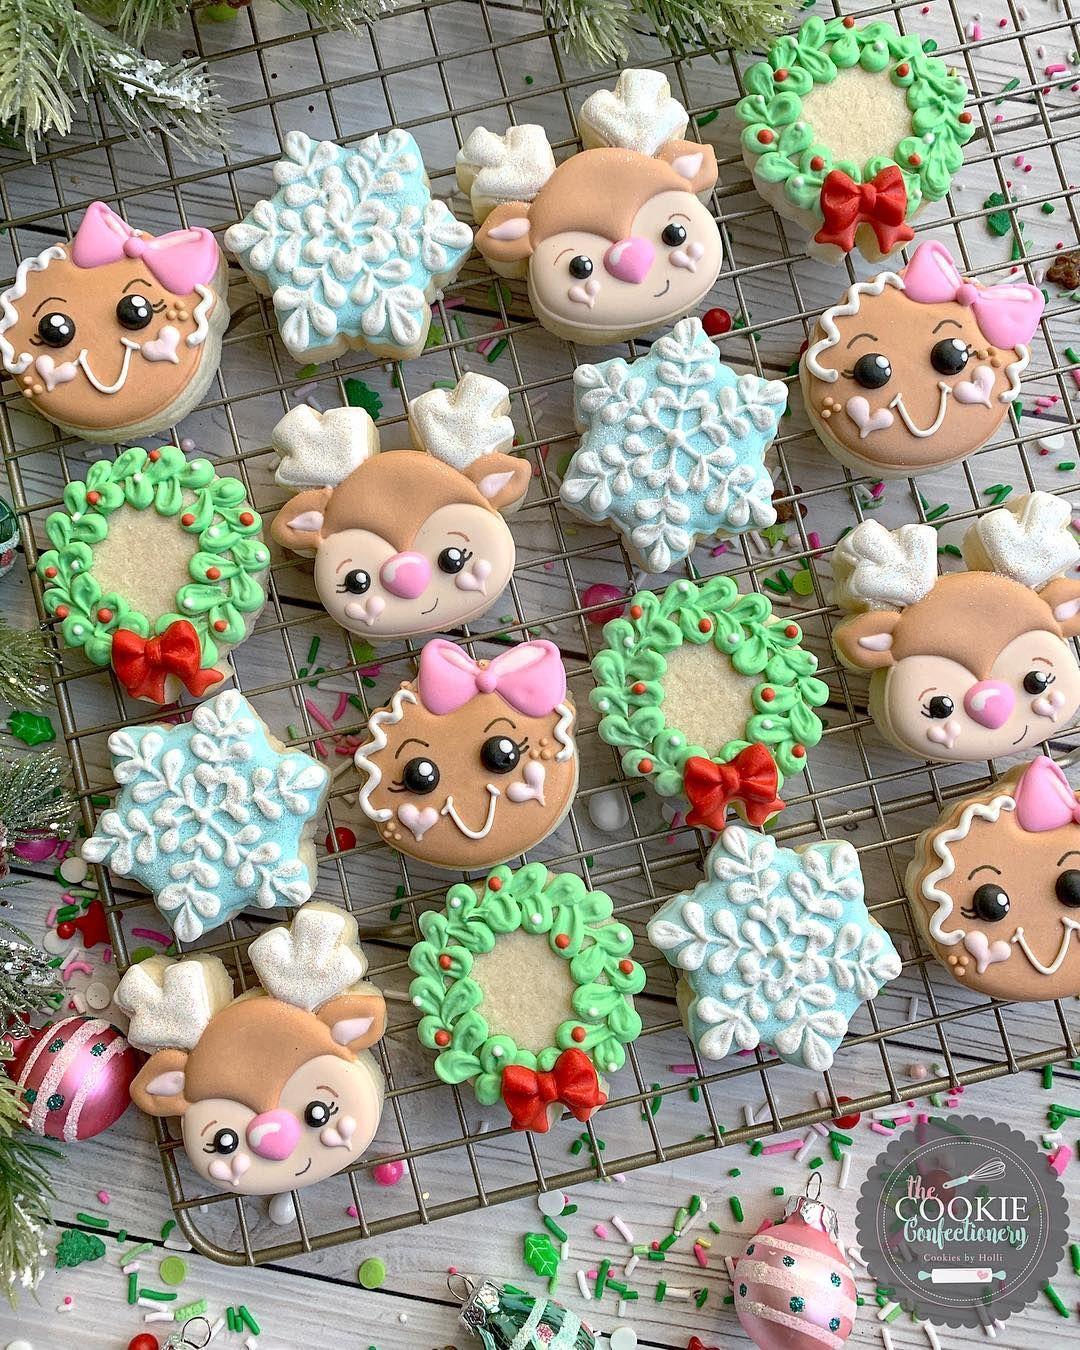 "Photo of Holli on Instagram: ""#Christmascookies2018 #christmascookies #xmascookies #cookies #sugarcookies #decoratedcookies #cookiesofinstagram #instasweet #instacookies…"""